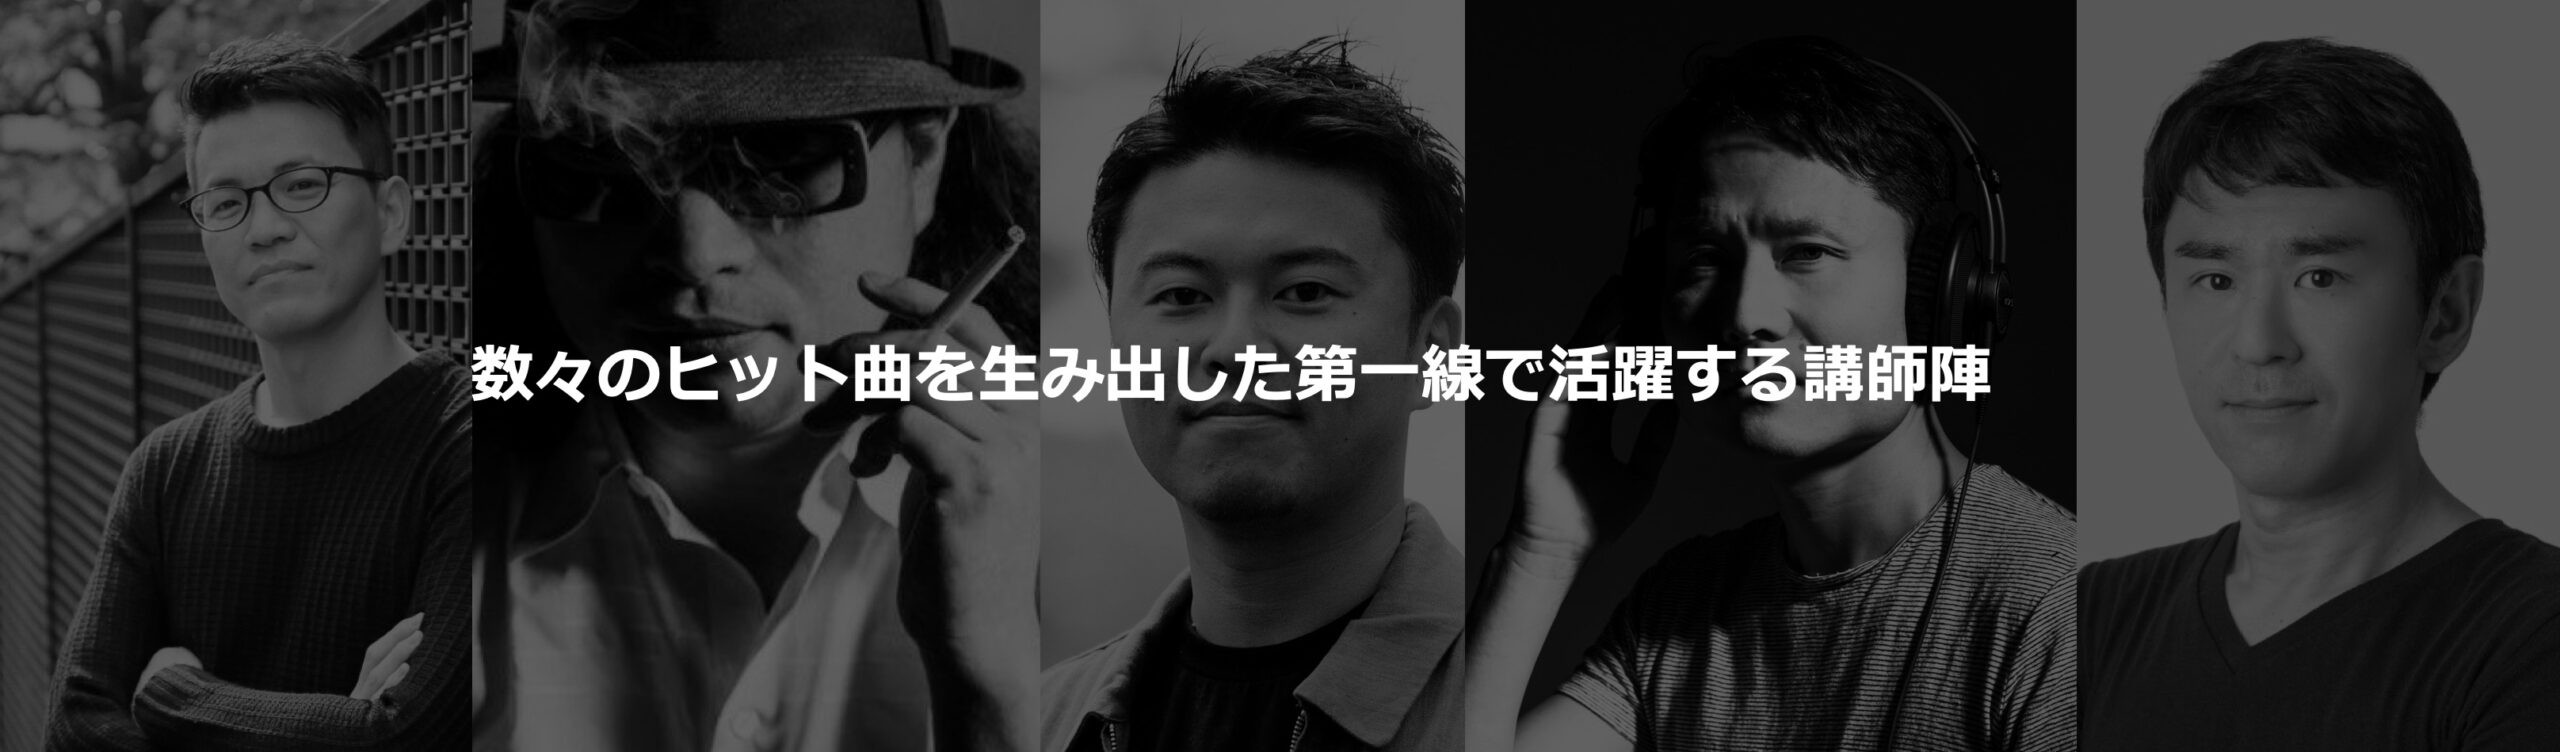 MUSIC x AI 音楽の人工知能を学ぶ 音楽TECHアカデミーCANPLAY